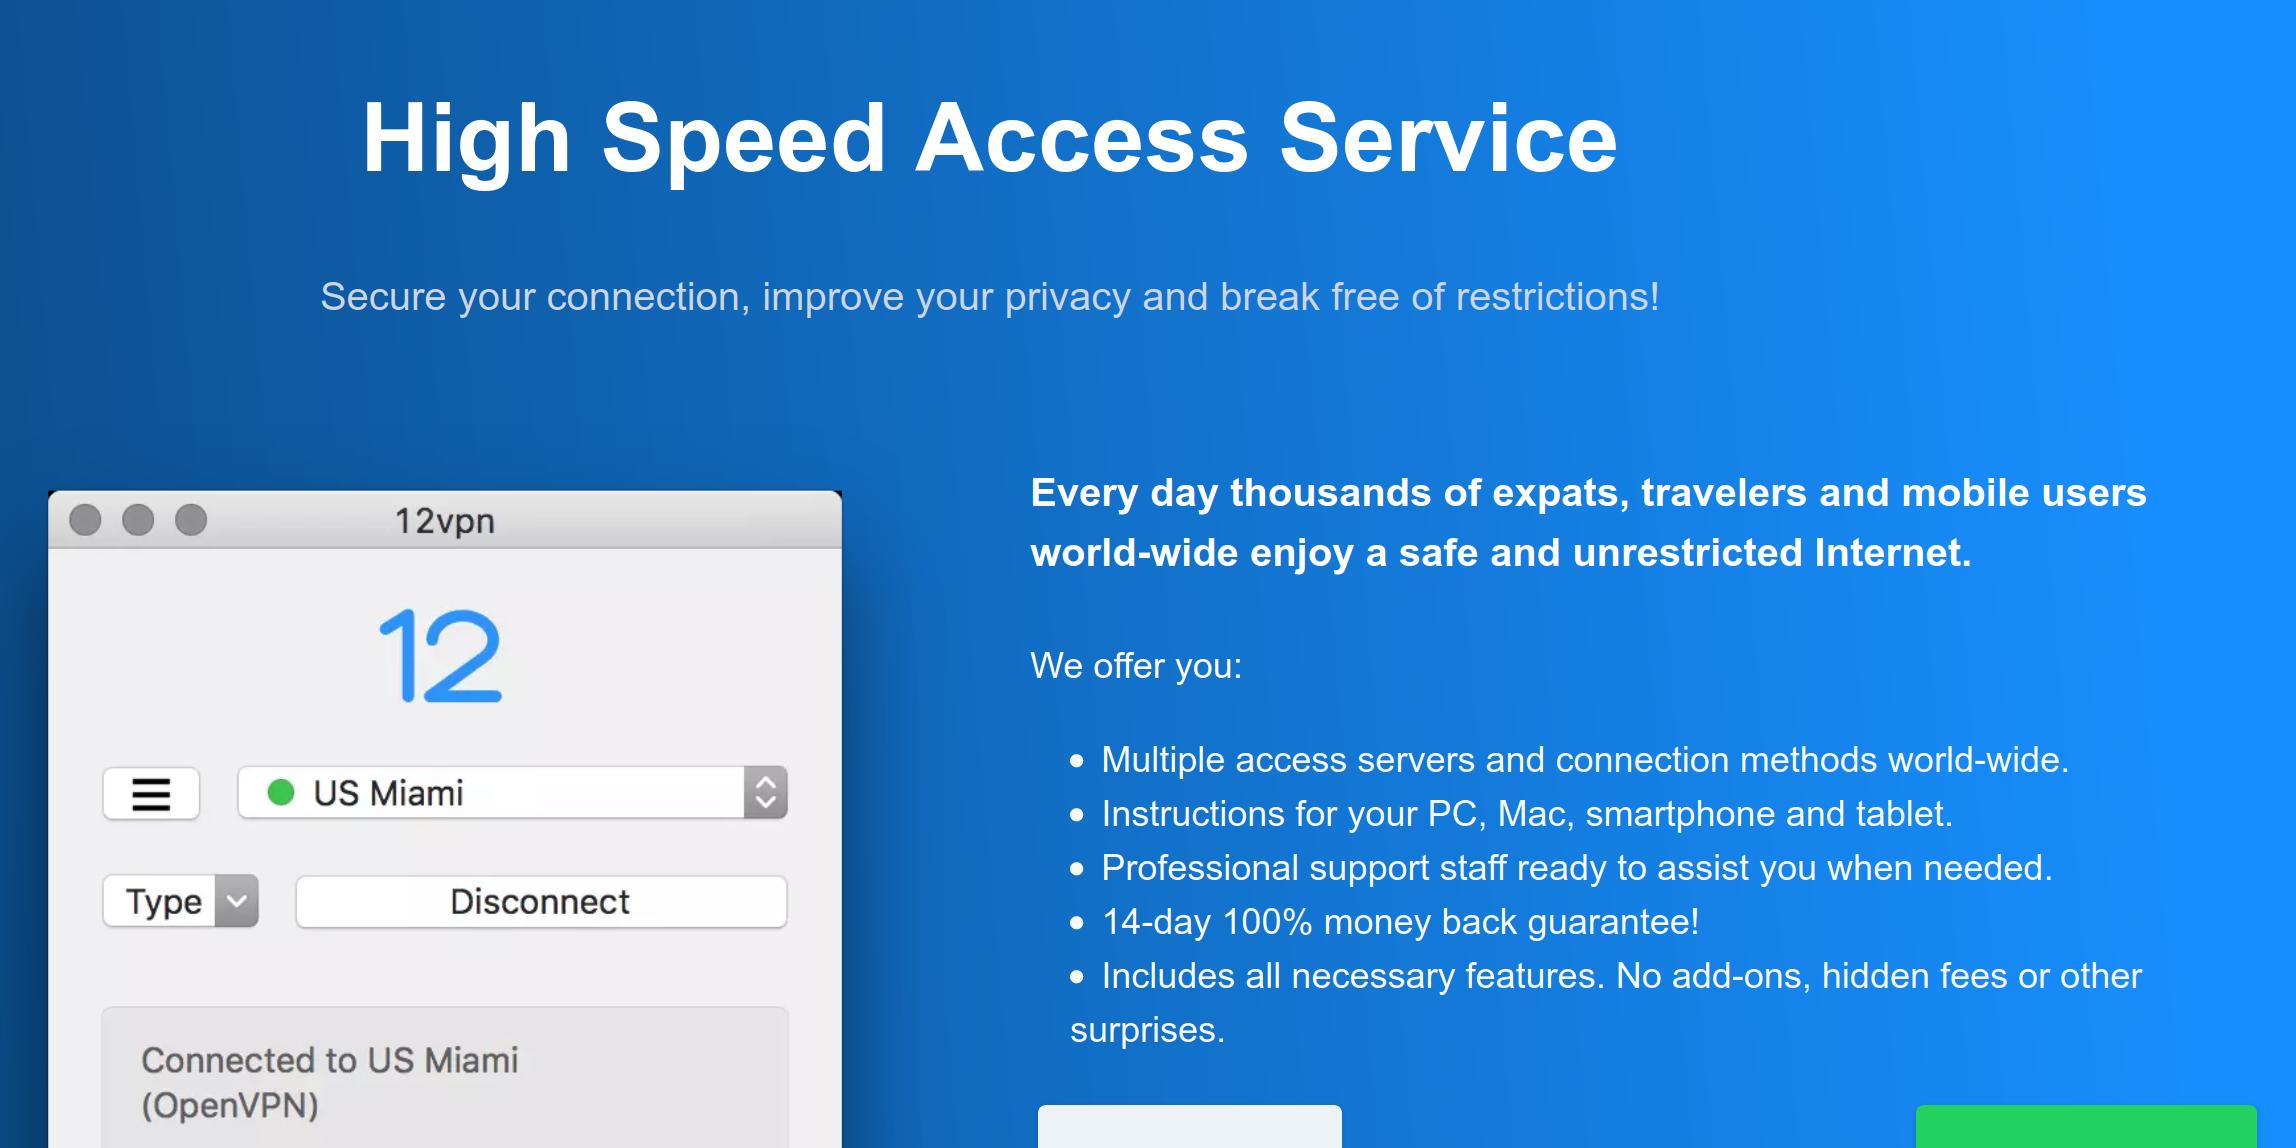 12vpx - High Speed Access Service